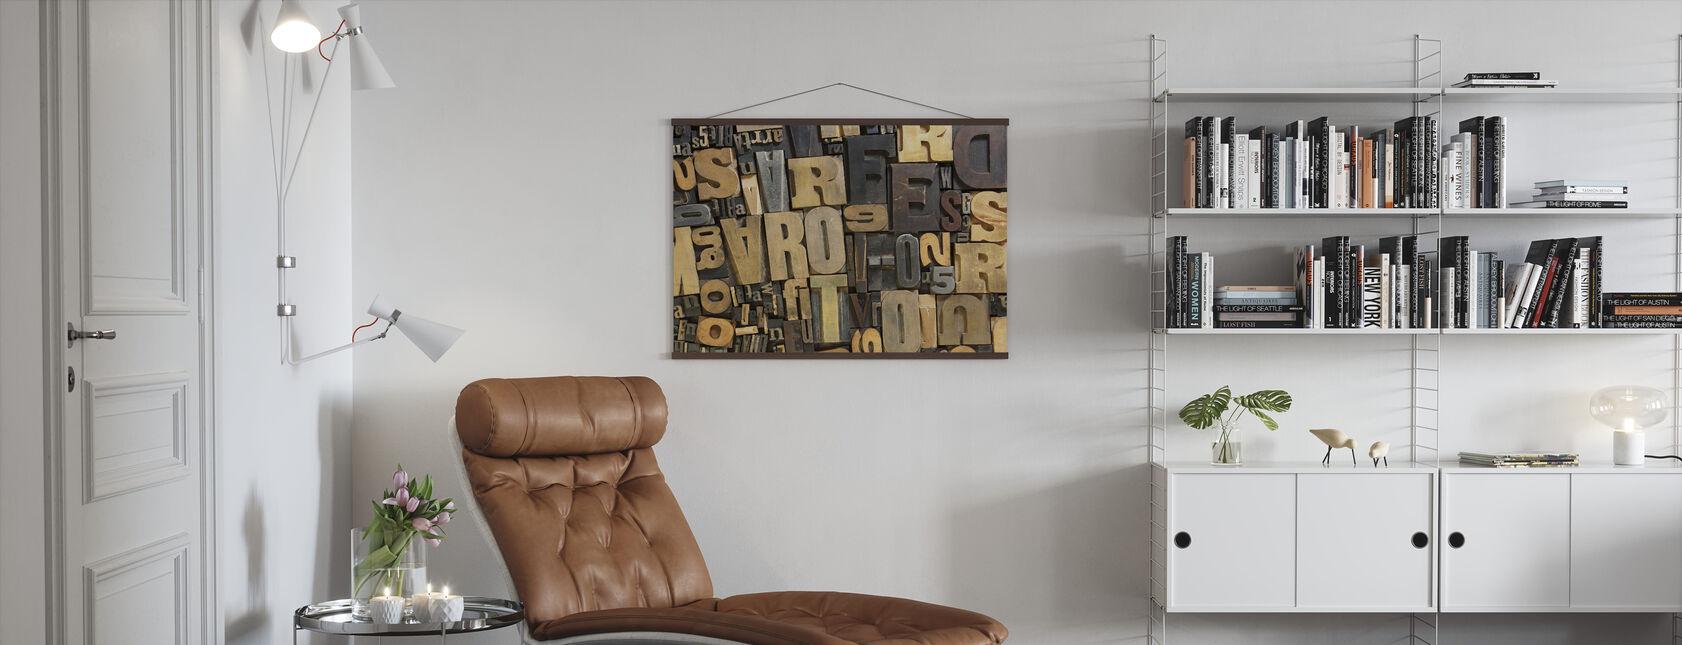 Lettres en bois vintage - Affiche - Salle à manger